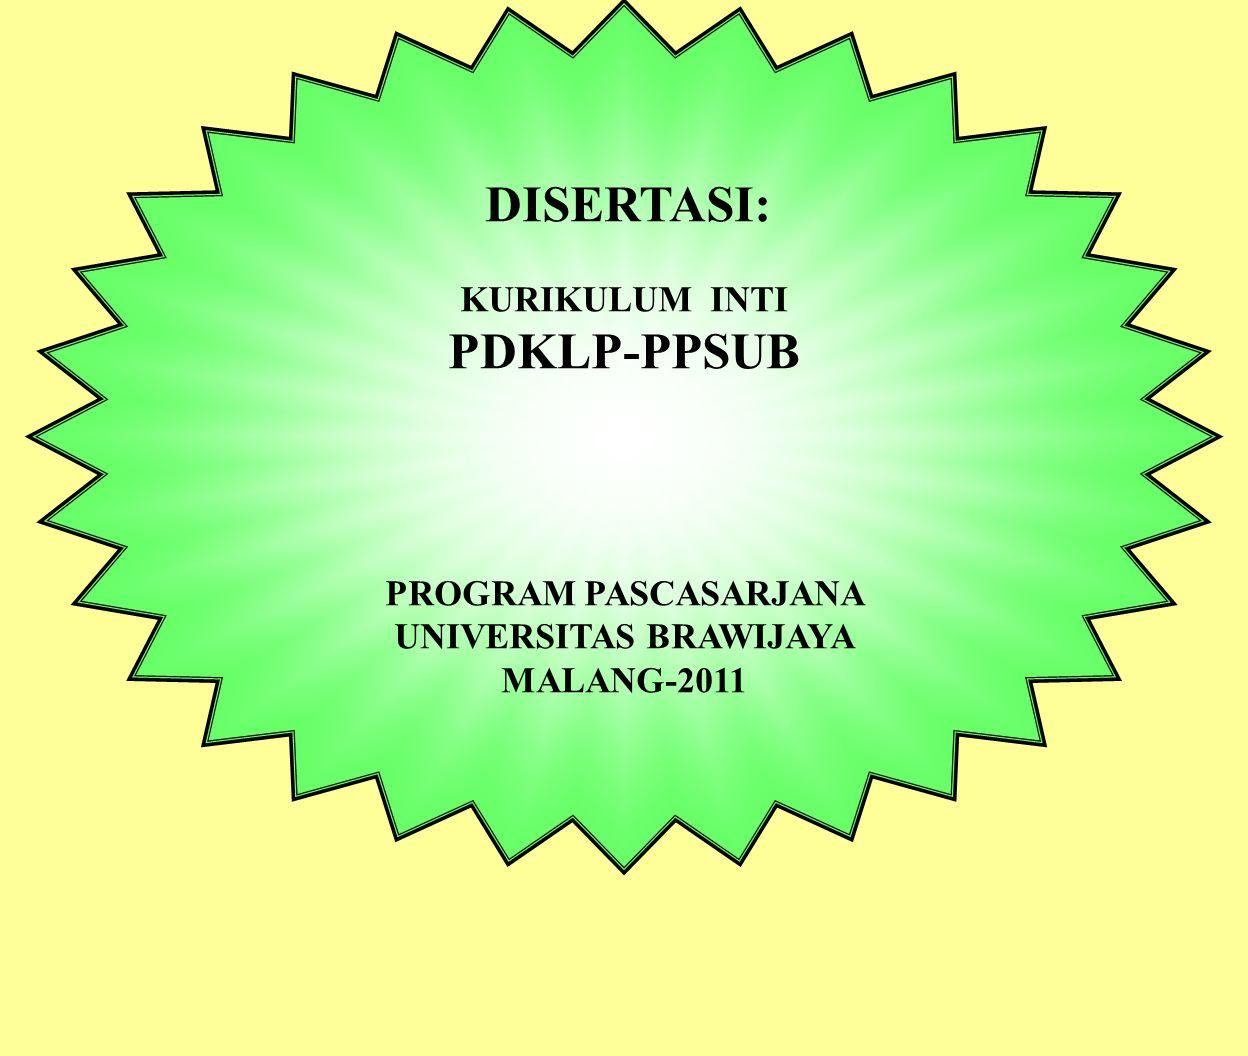 DISERTASI: KURIKULUM INTI PDKLP-PPSUB PROGRAM PASCASARJANA UNIVERSITAS BRAWIJAYA MALANG-2011